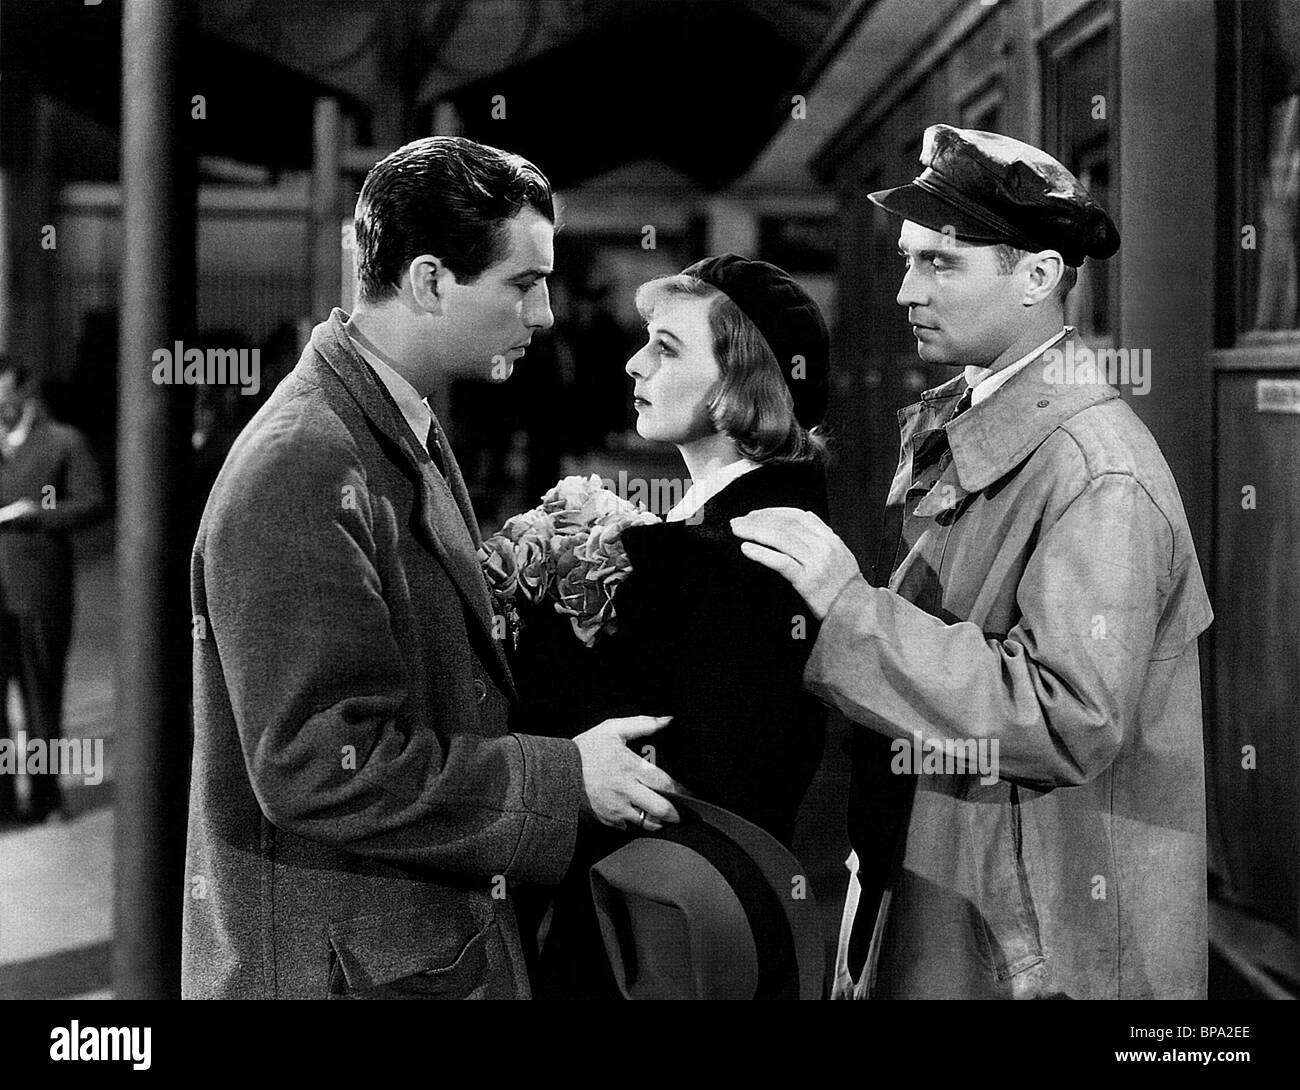 ROBERT TAYLOR MARGARET SULLAVAN & Franchot Tone trois camarades (1938) Photo Stock